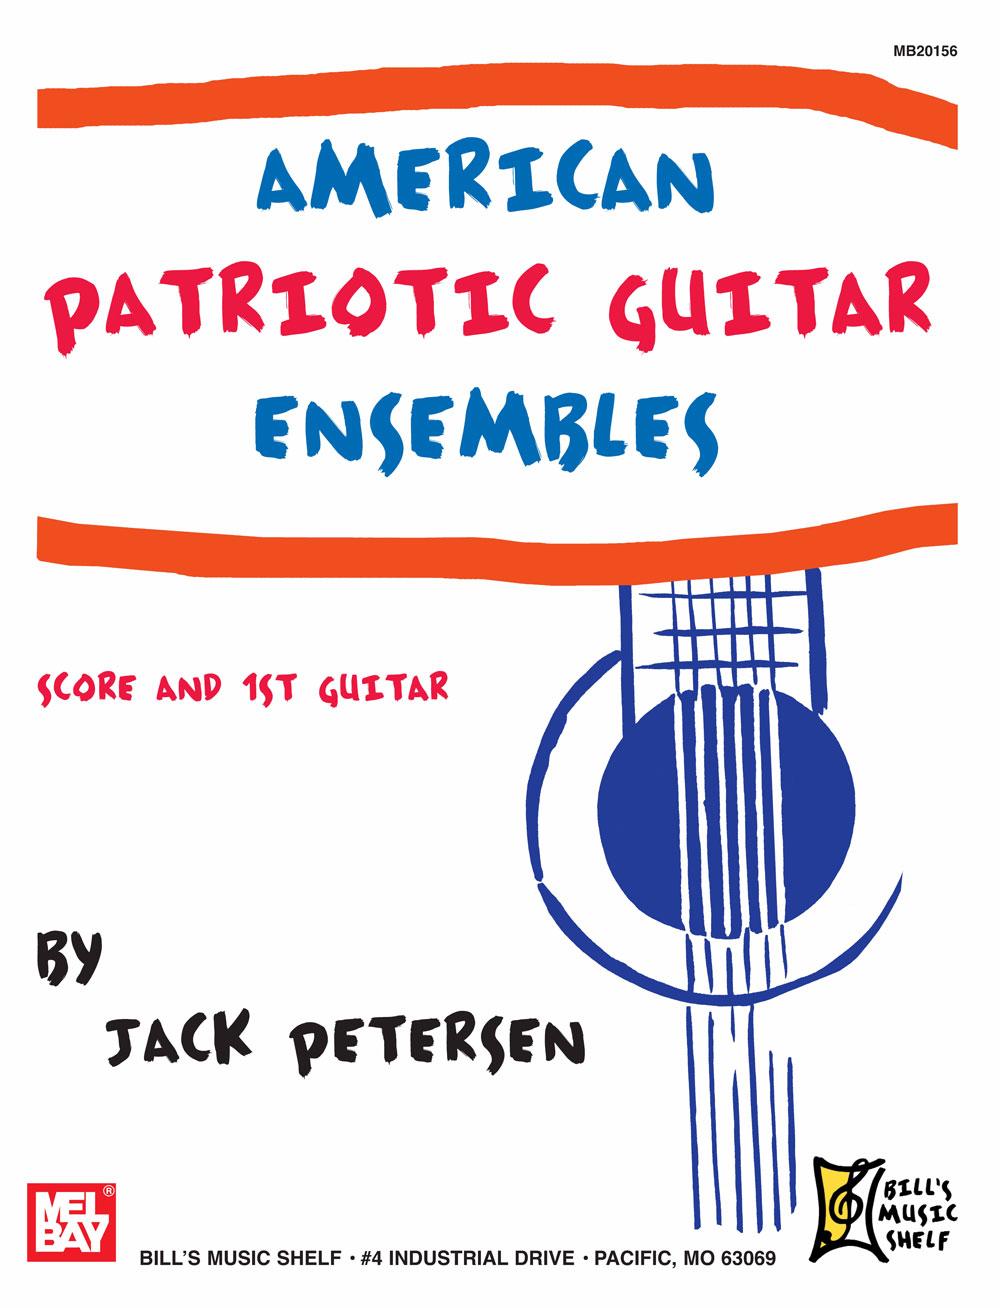 American Patriotic Guitar Ensembles